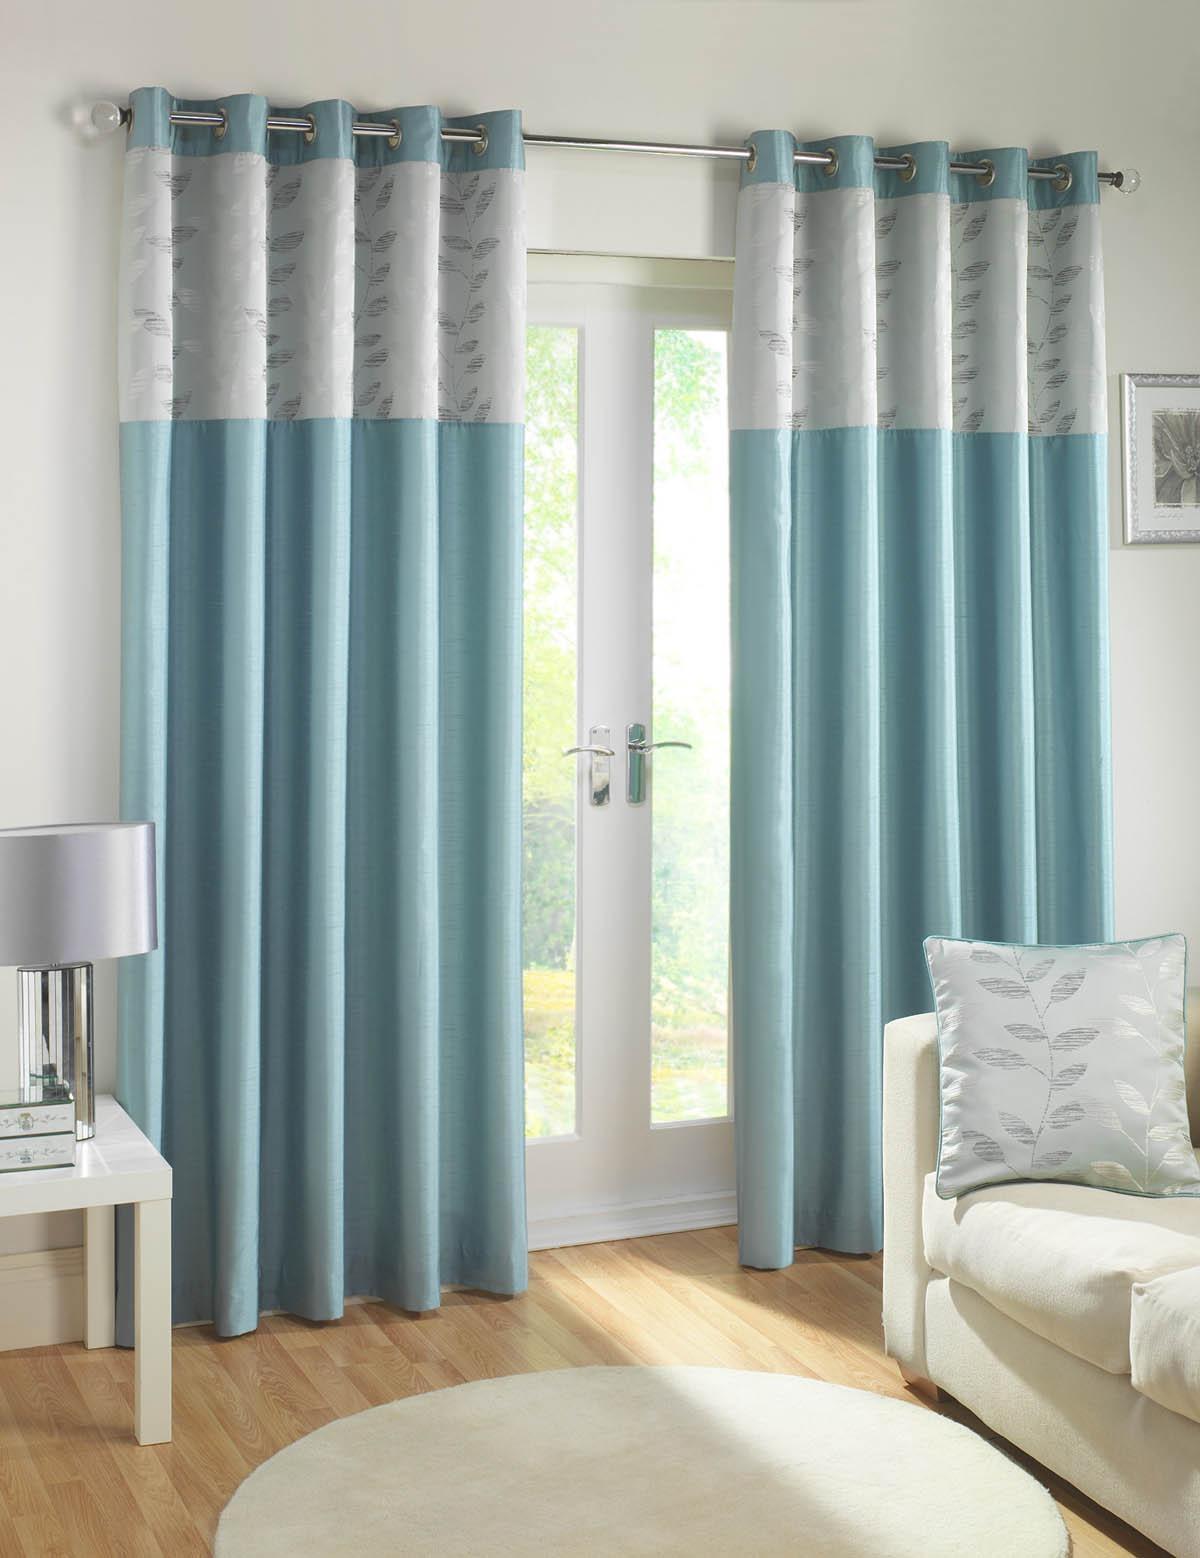 15 ideas of duck egg blue blackout curtains curtain ideas. Black Bedroom Furniture Sets. Home Design Ideas